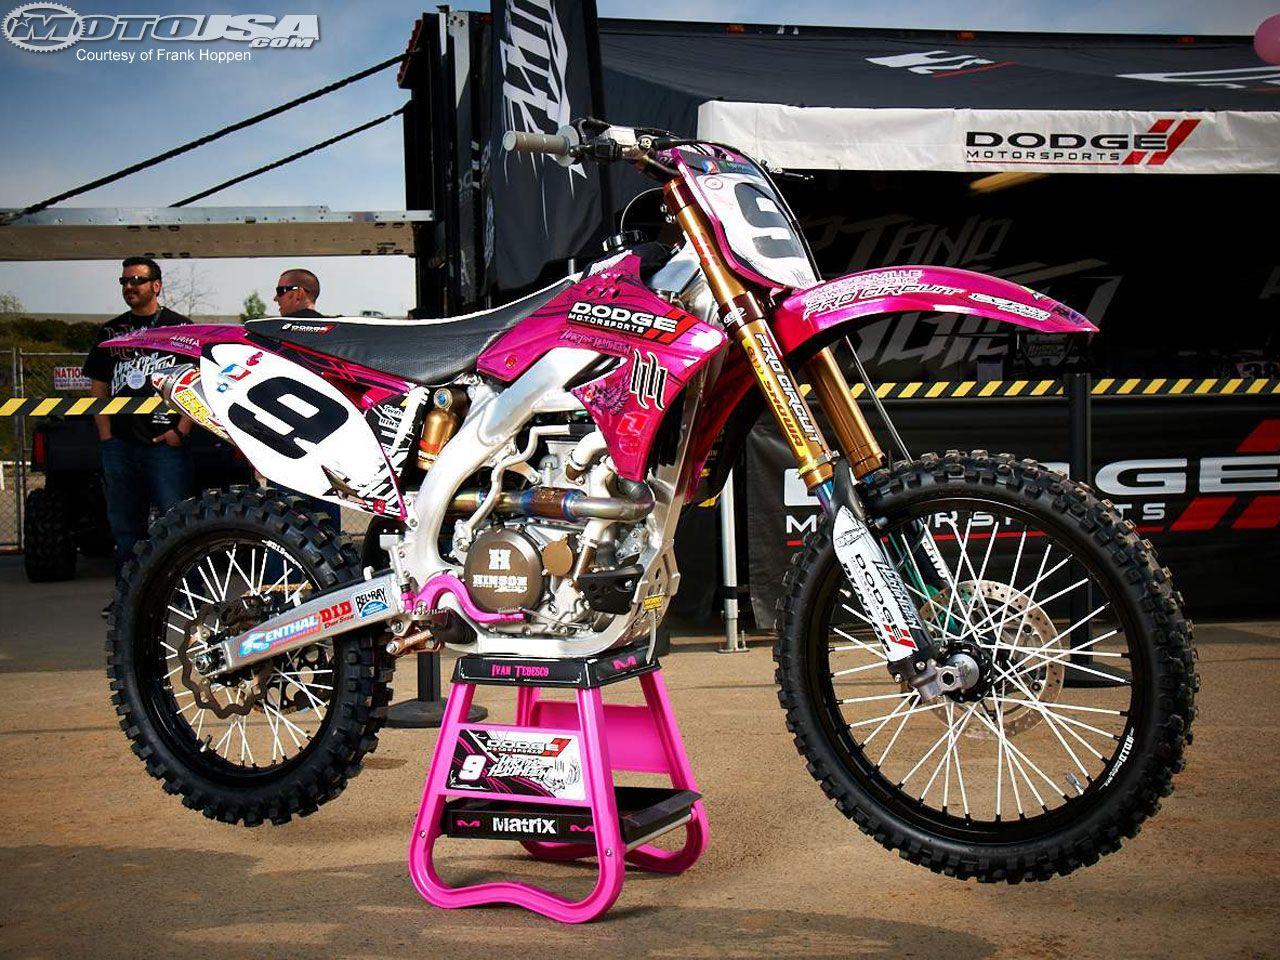 Pink Dirt Bike Displaying 15 Images For Pink Dirt Bikes For Sale Pink Dirt Bike Dirt Bikes For Sale Cool Dirt Bikes